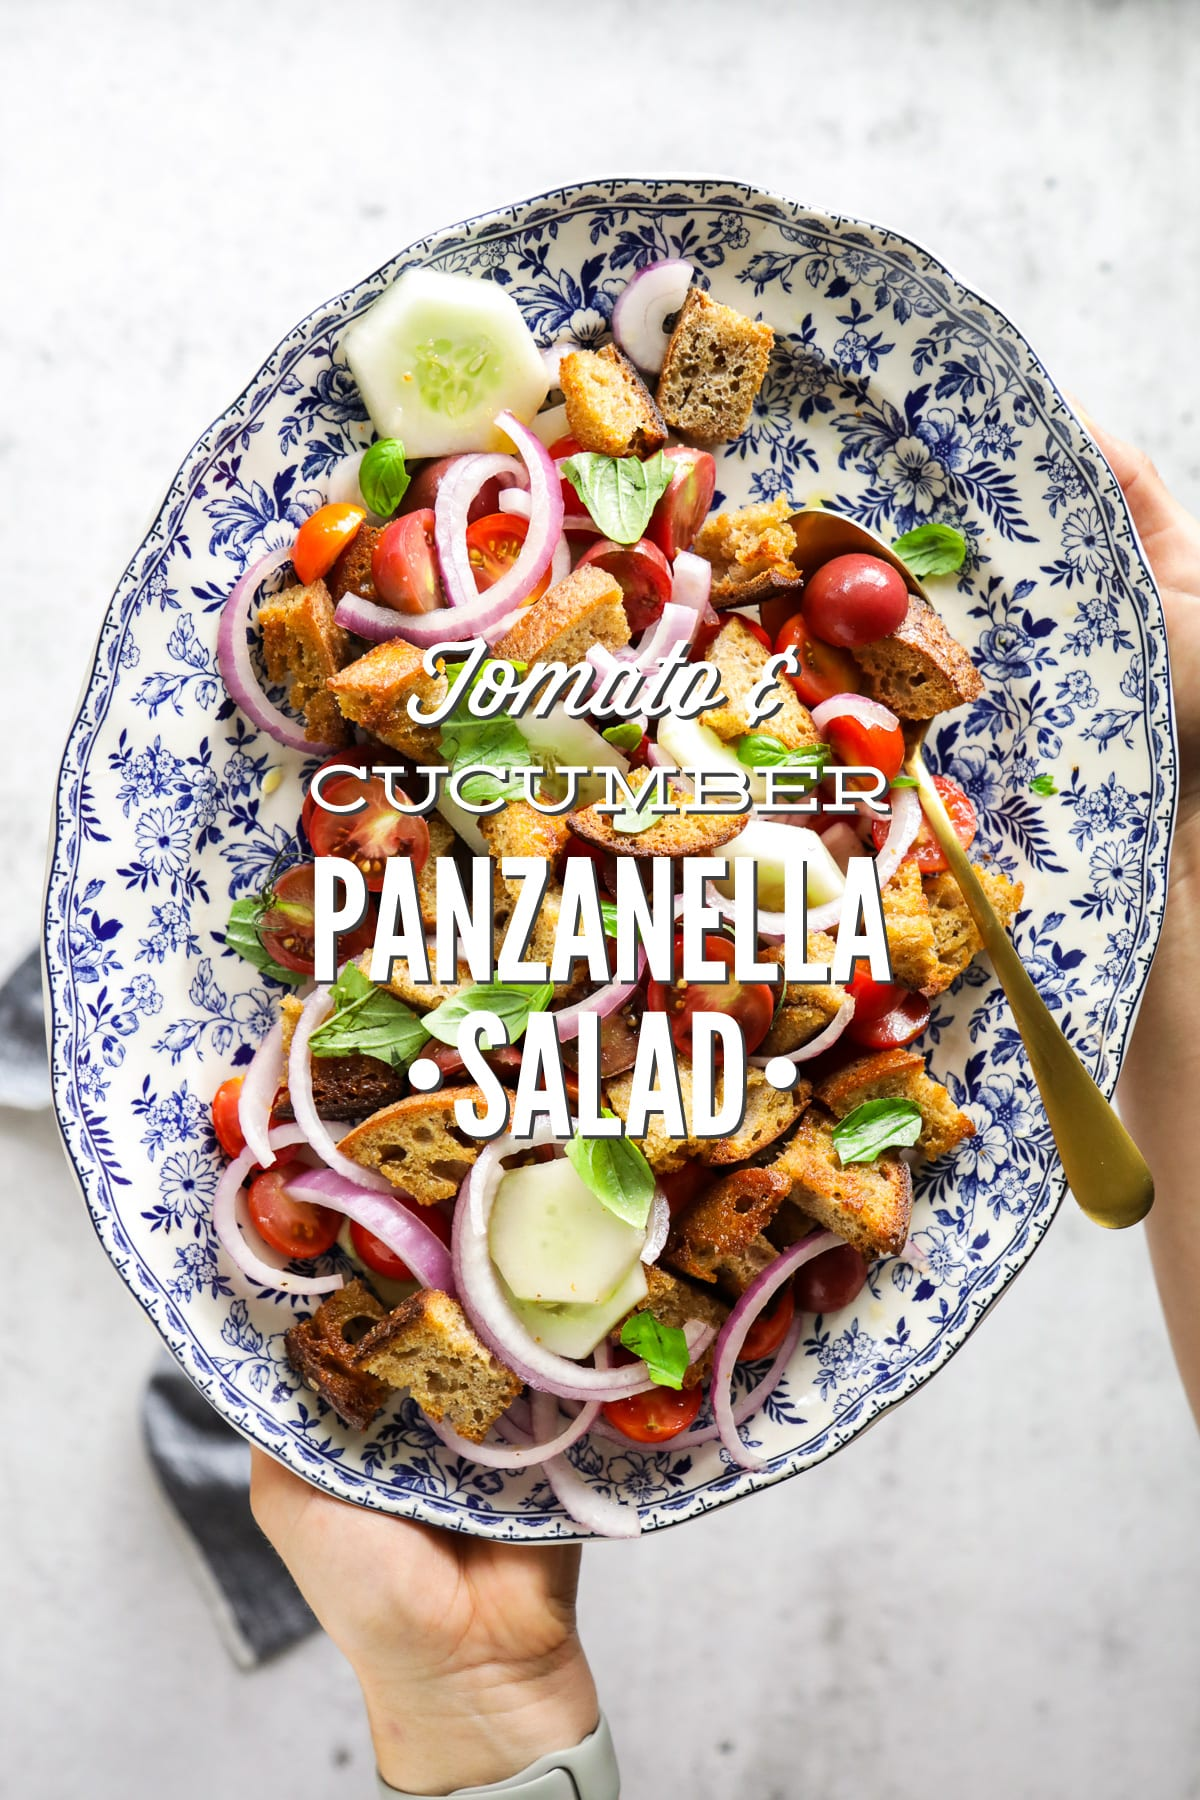 Tomato and Cucumber Panzanella Salad